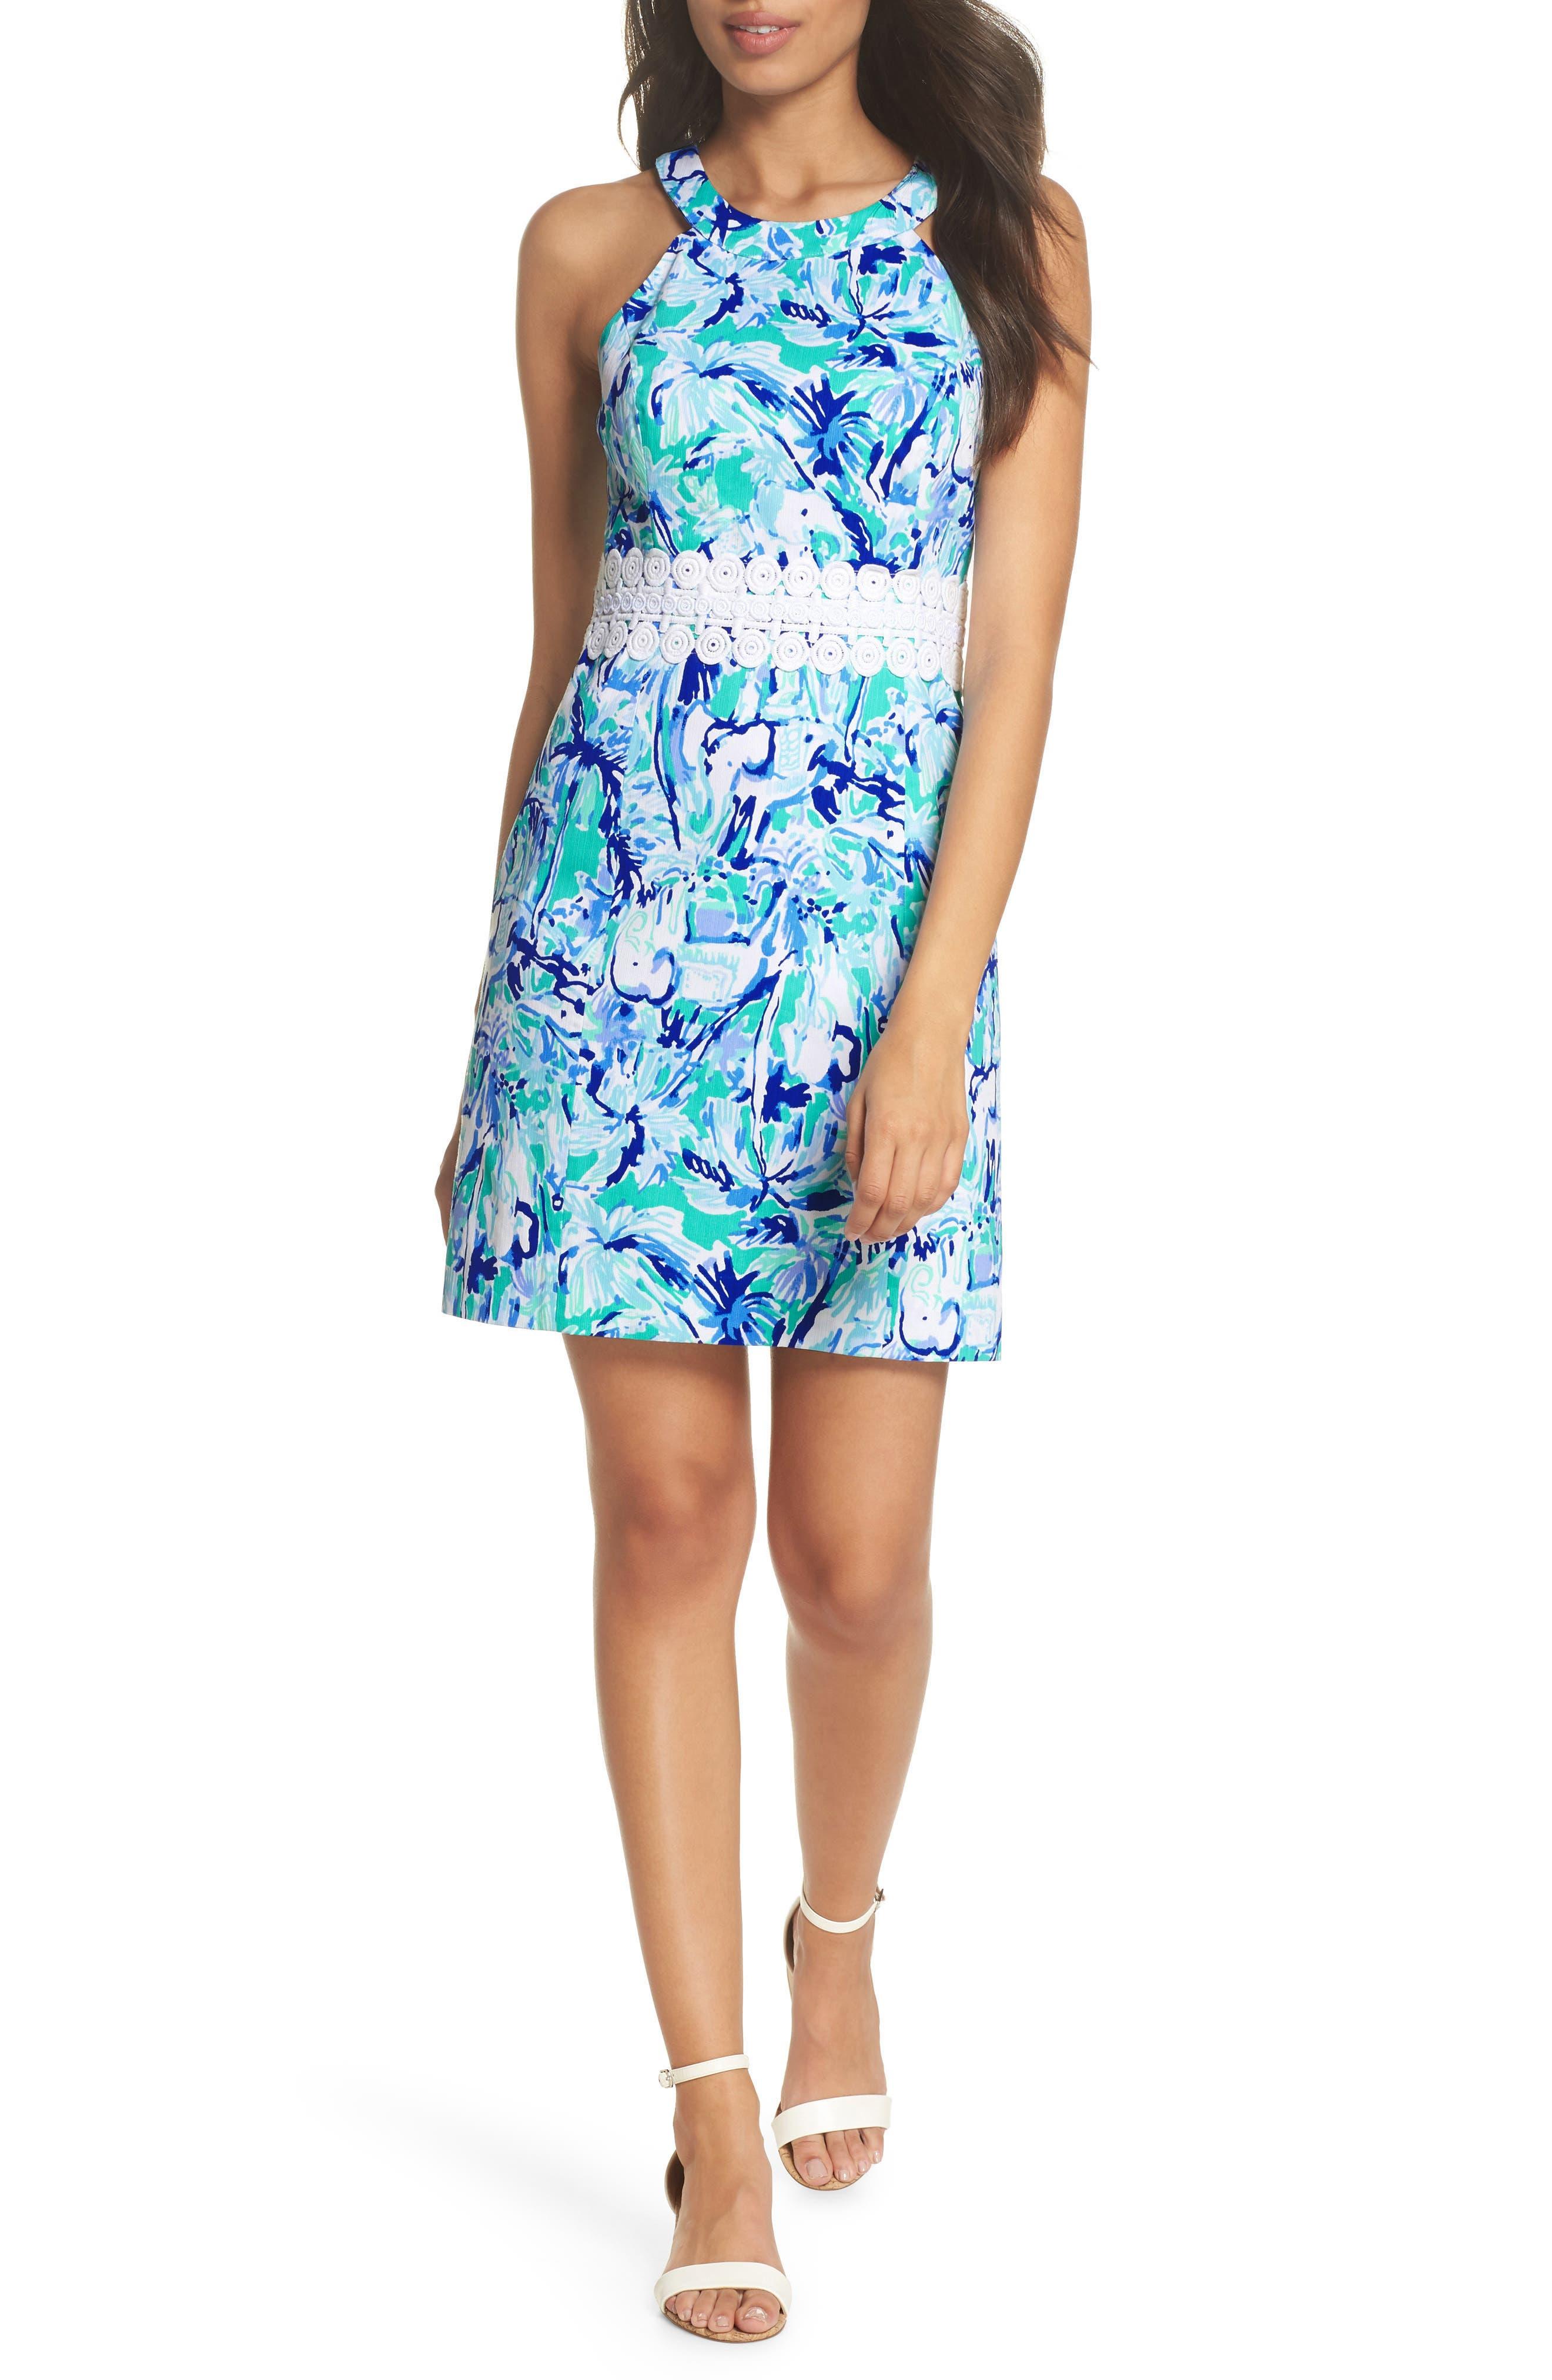 Alternate Image 1 Selected - Lilly Pulitzer® Ashlyn Sheath Dress